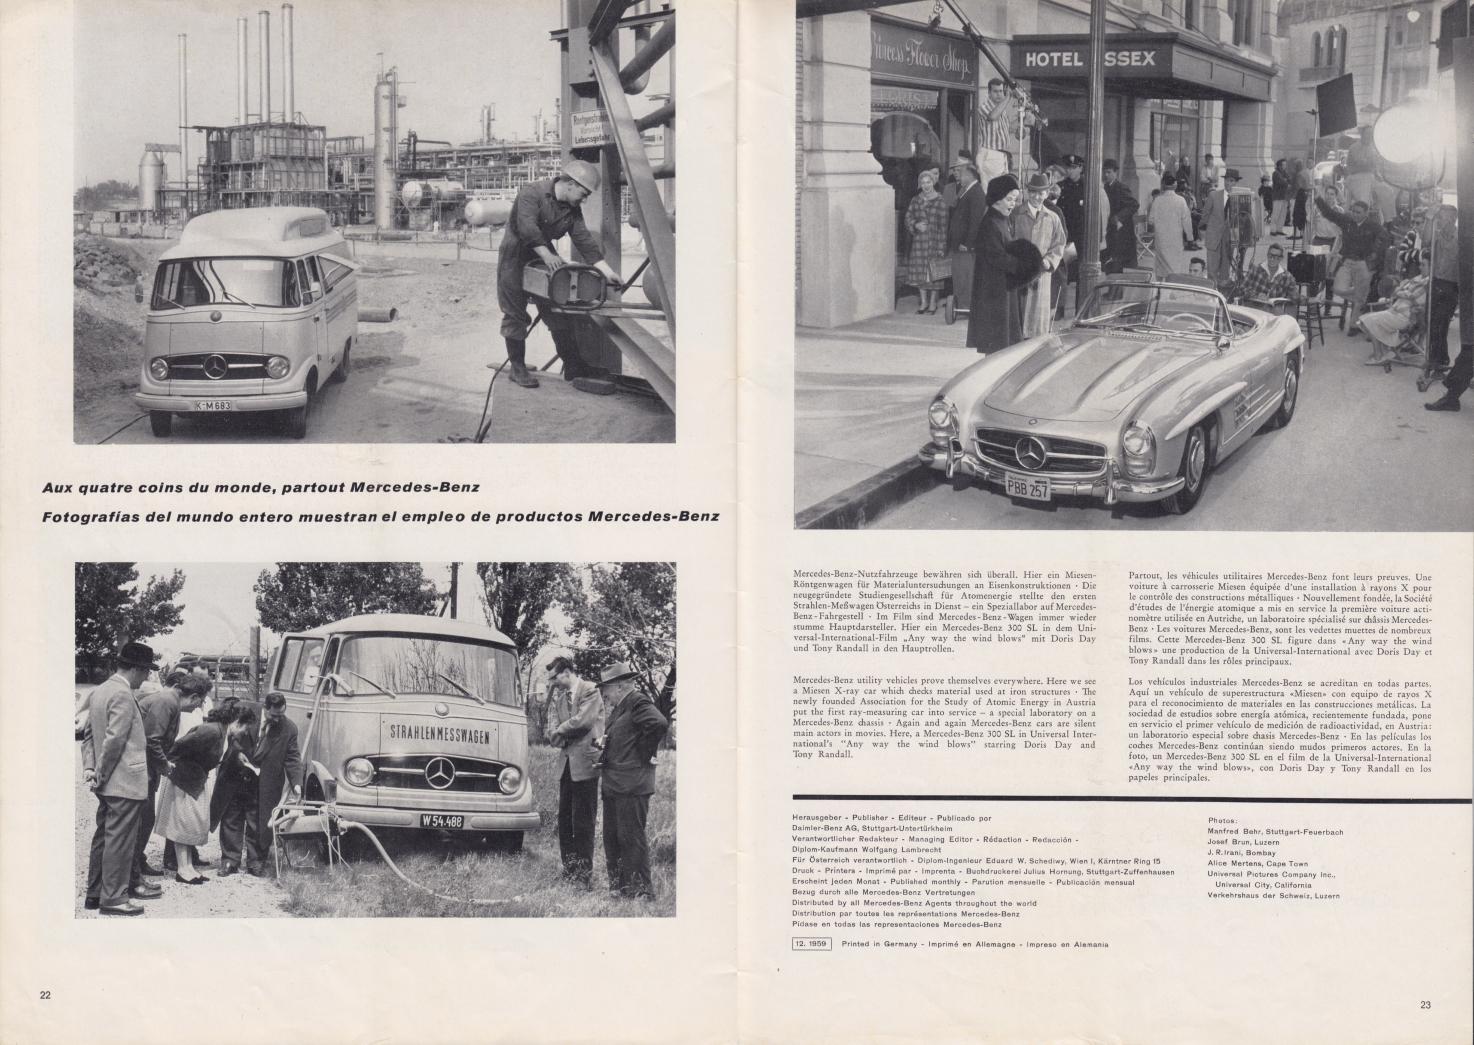 (REVISTA): Periódico In aller welt n.º 37 - Mercedes-Benz no mundo - 1959 - multilingue 012